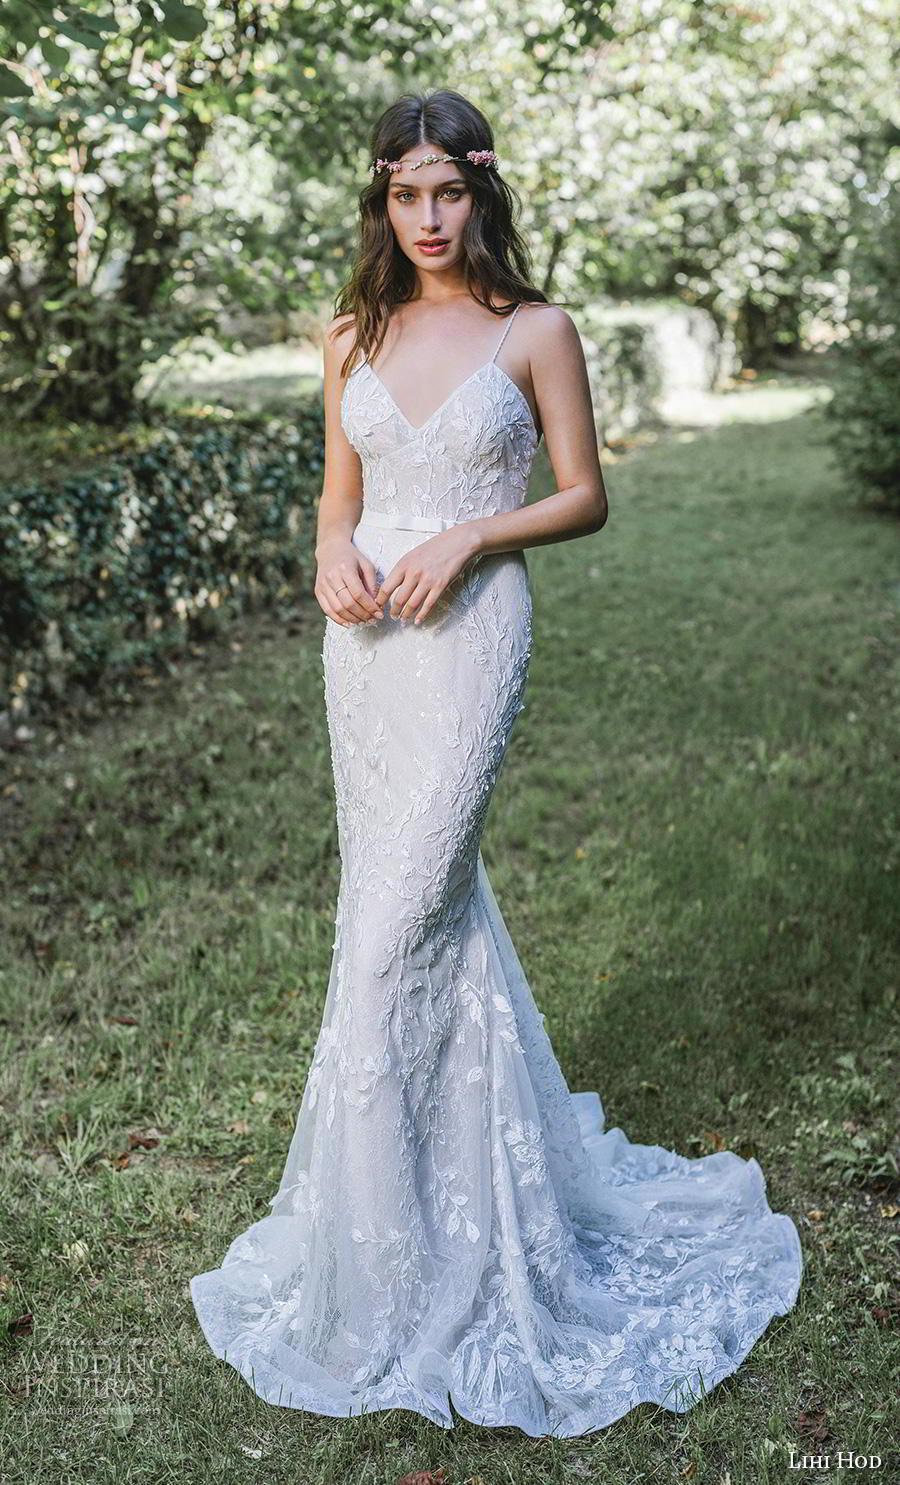 lihi hod 2019 bridal spaghetti strap diamond neckline full embellishment elegant fit and flare sheath wedding dress backless sweep train (4) mv